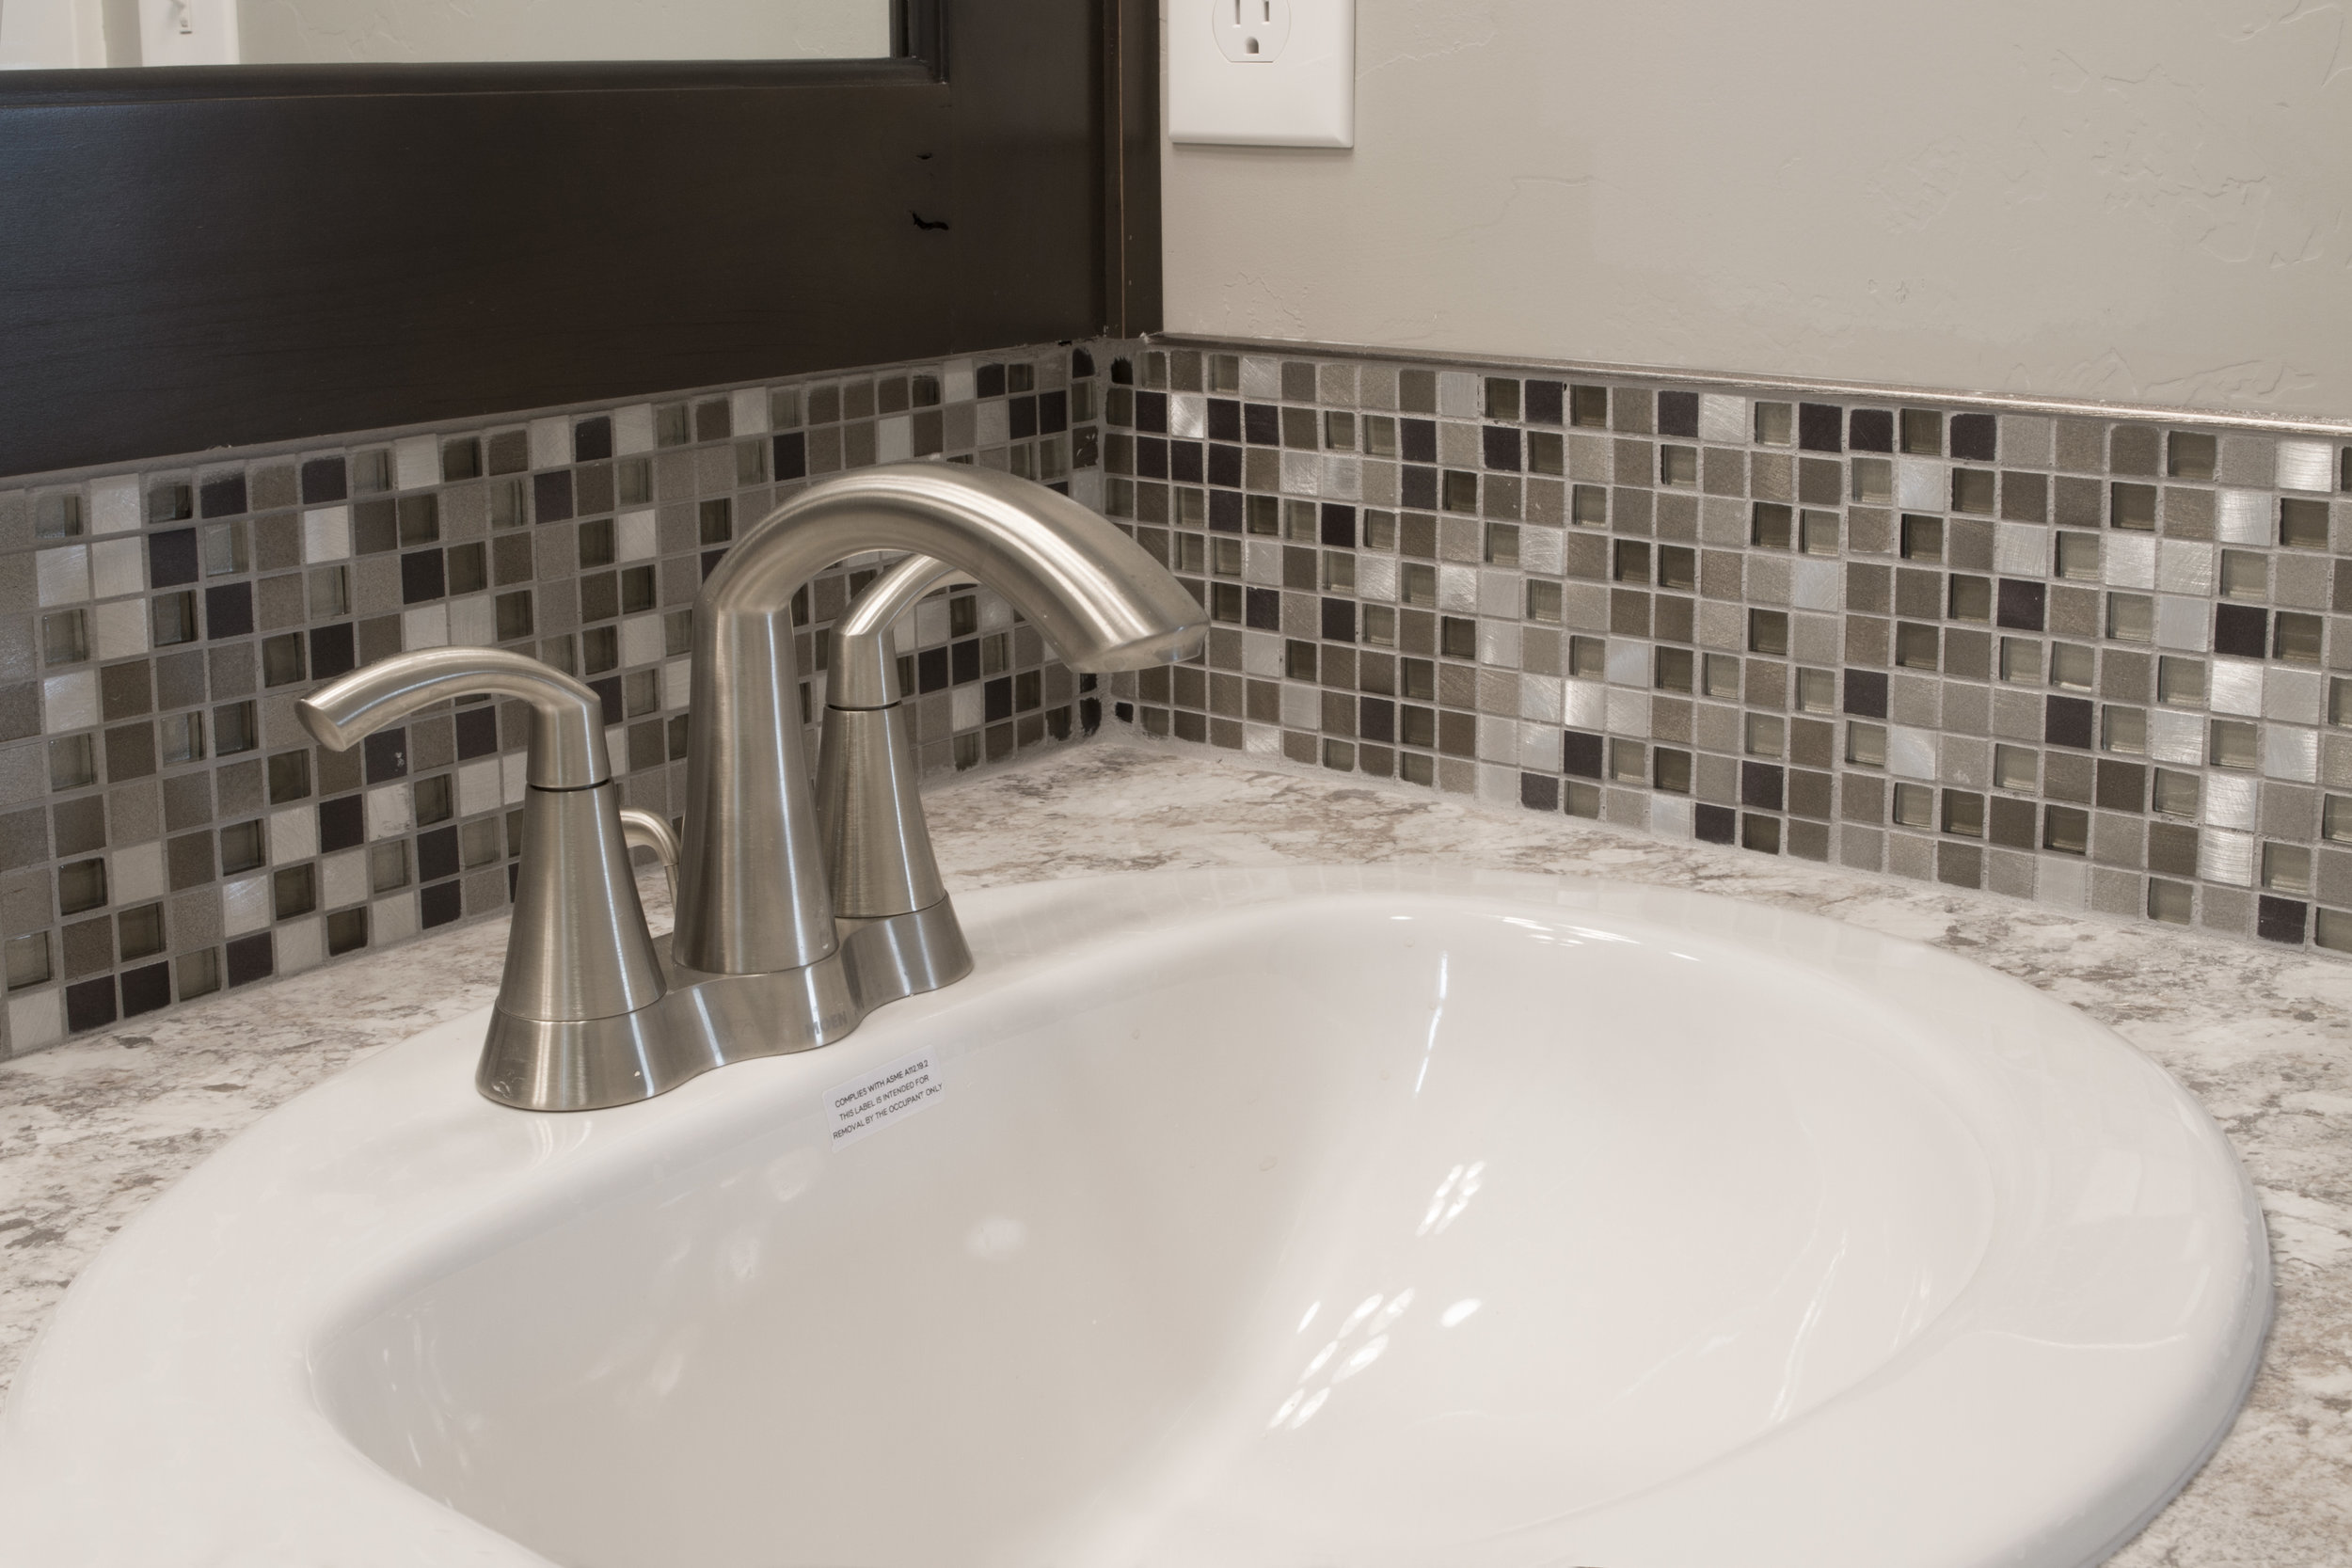 Gray Glass and Metallic Bathroom Backsplash Tile